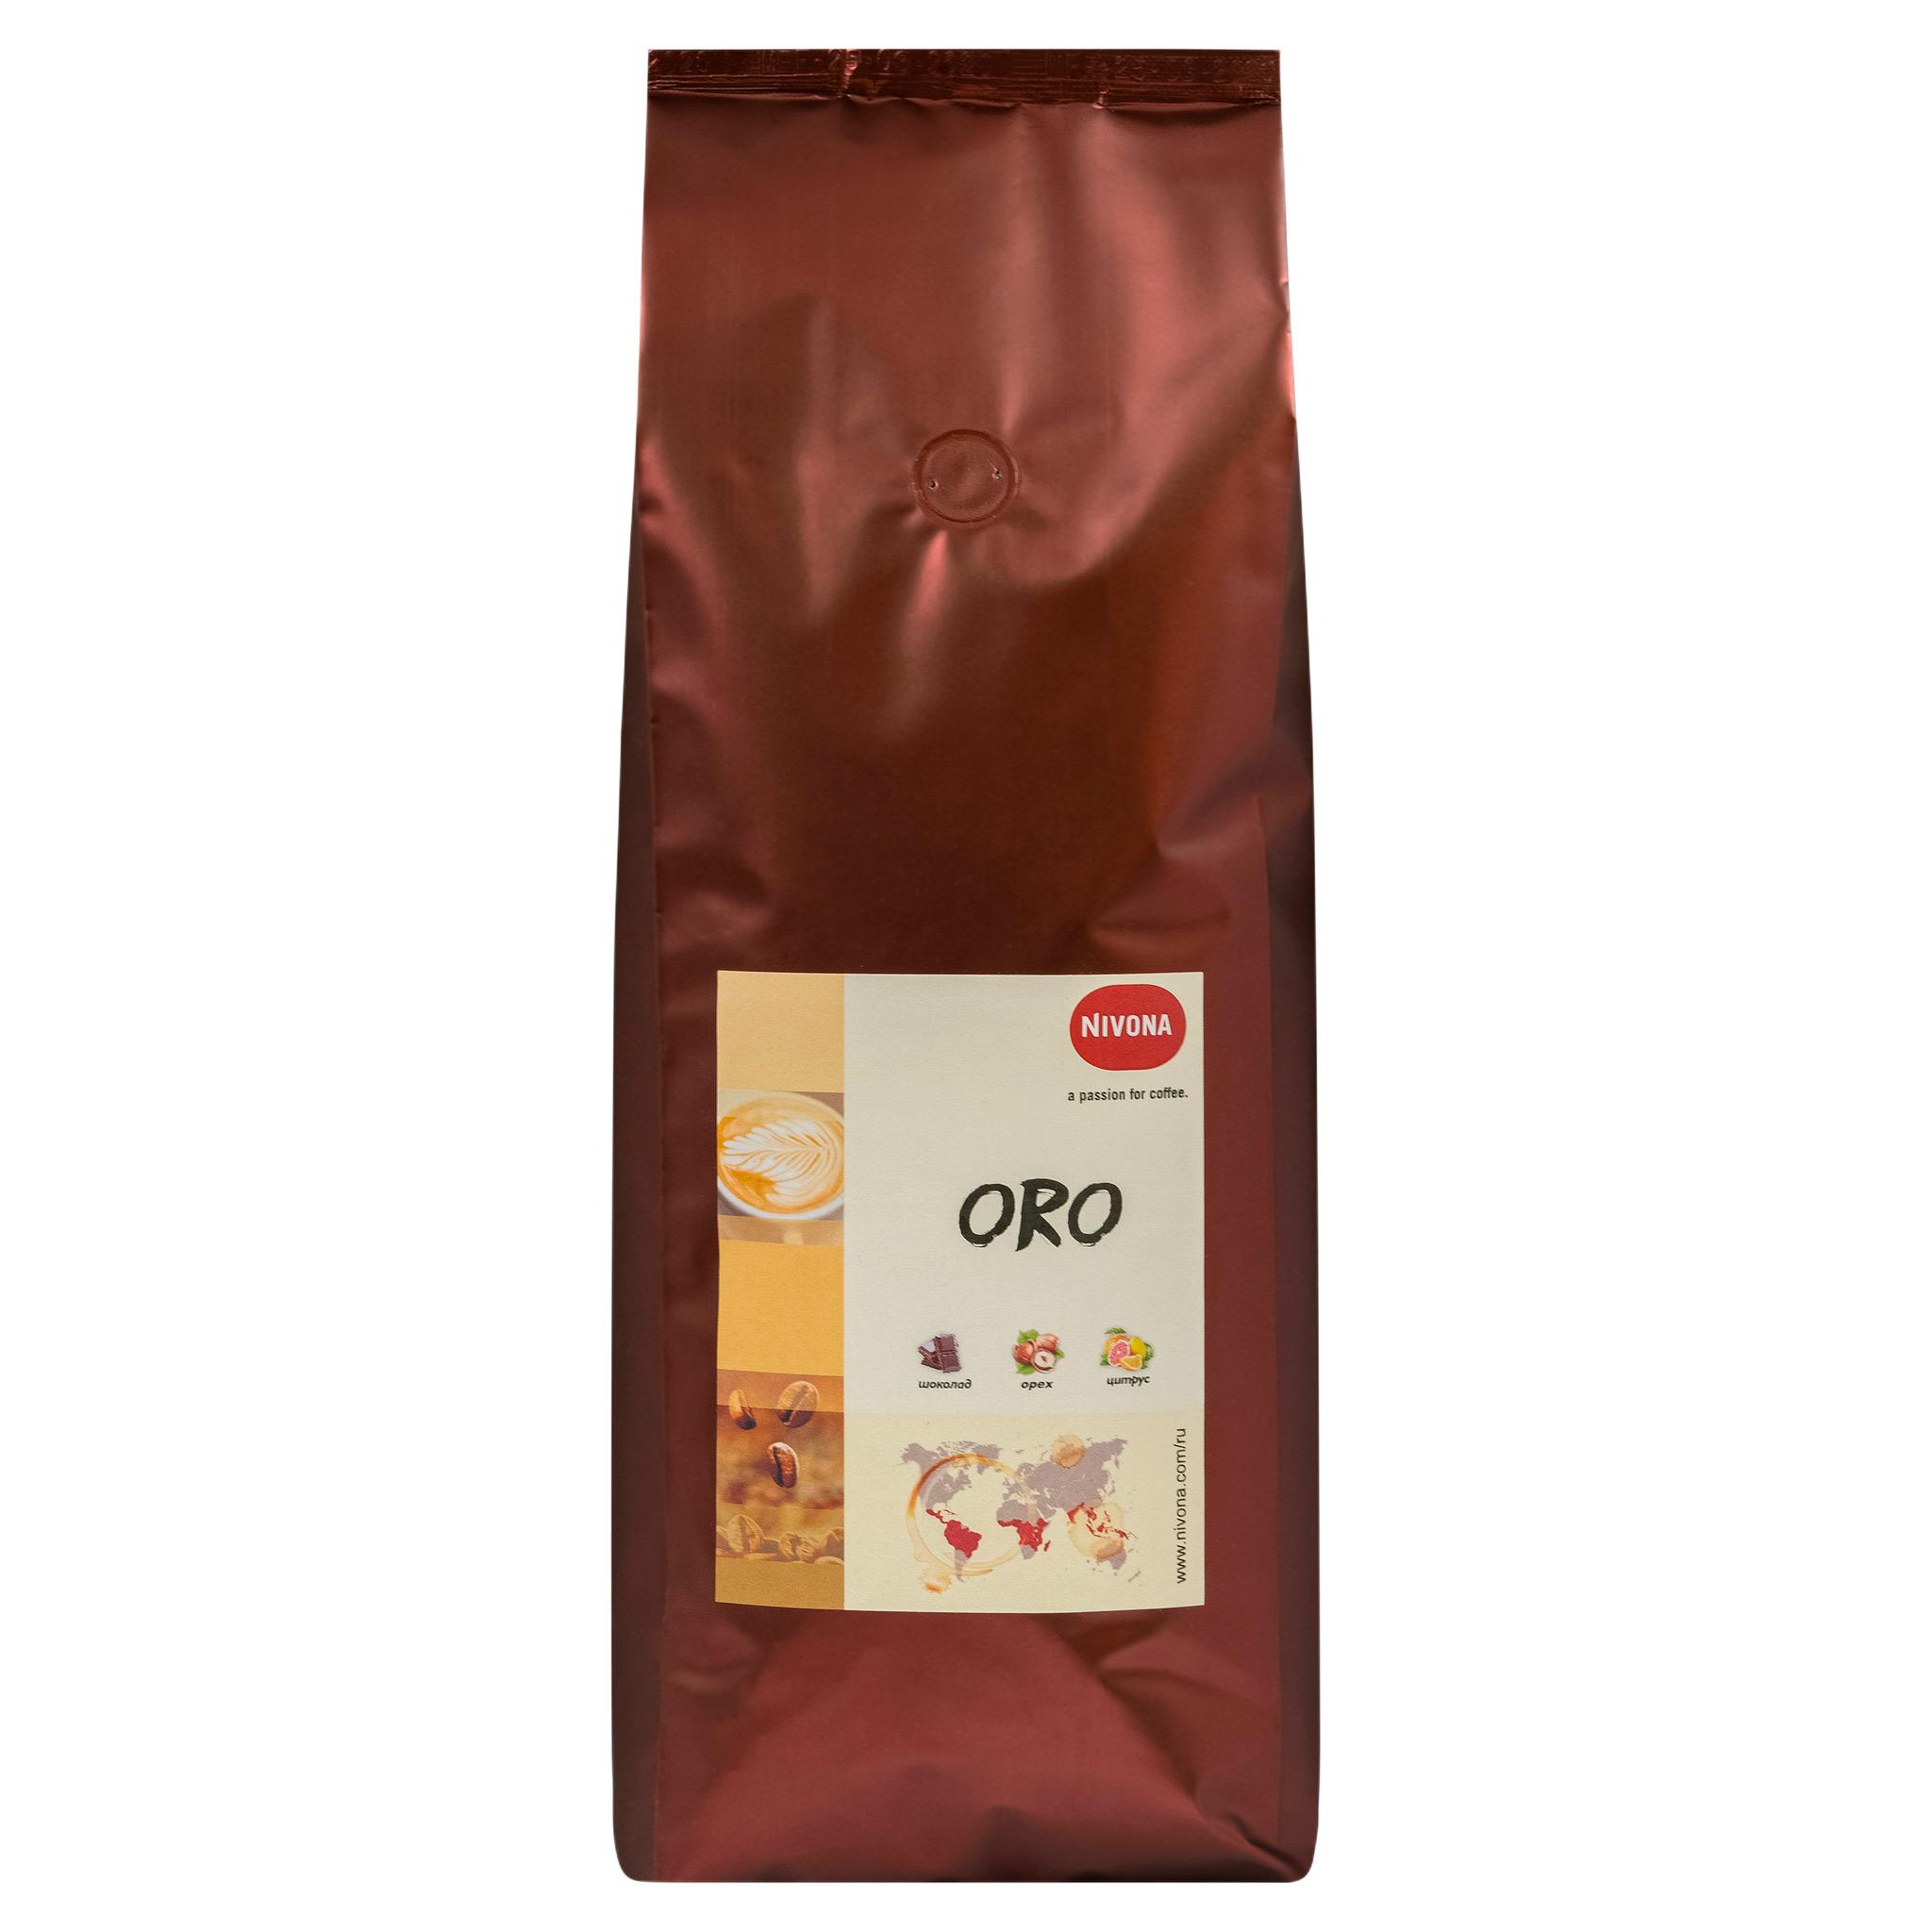 Кофе в зернах Nivona ORO, 1 кг